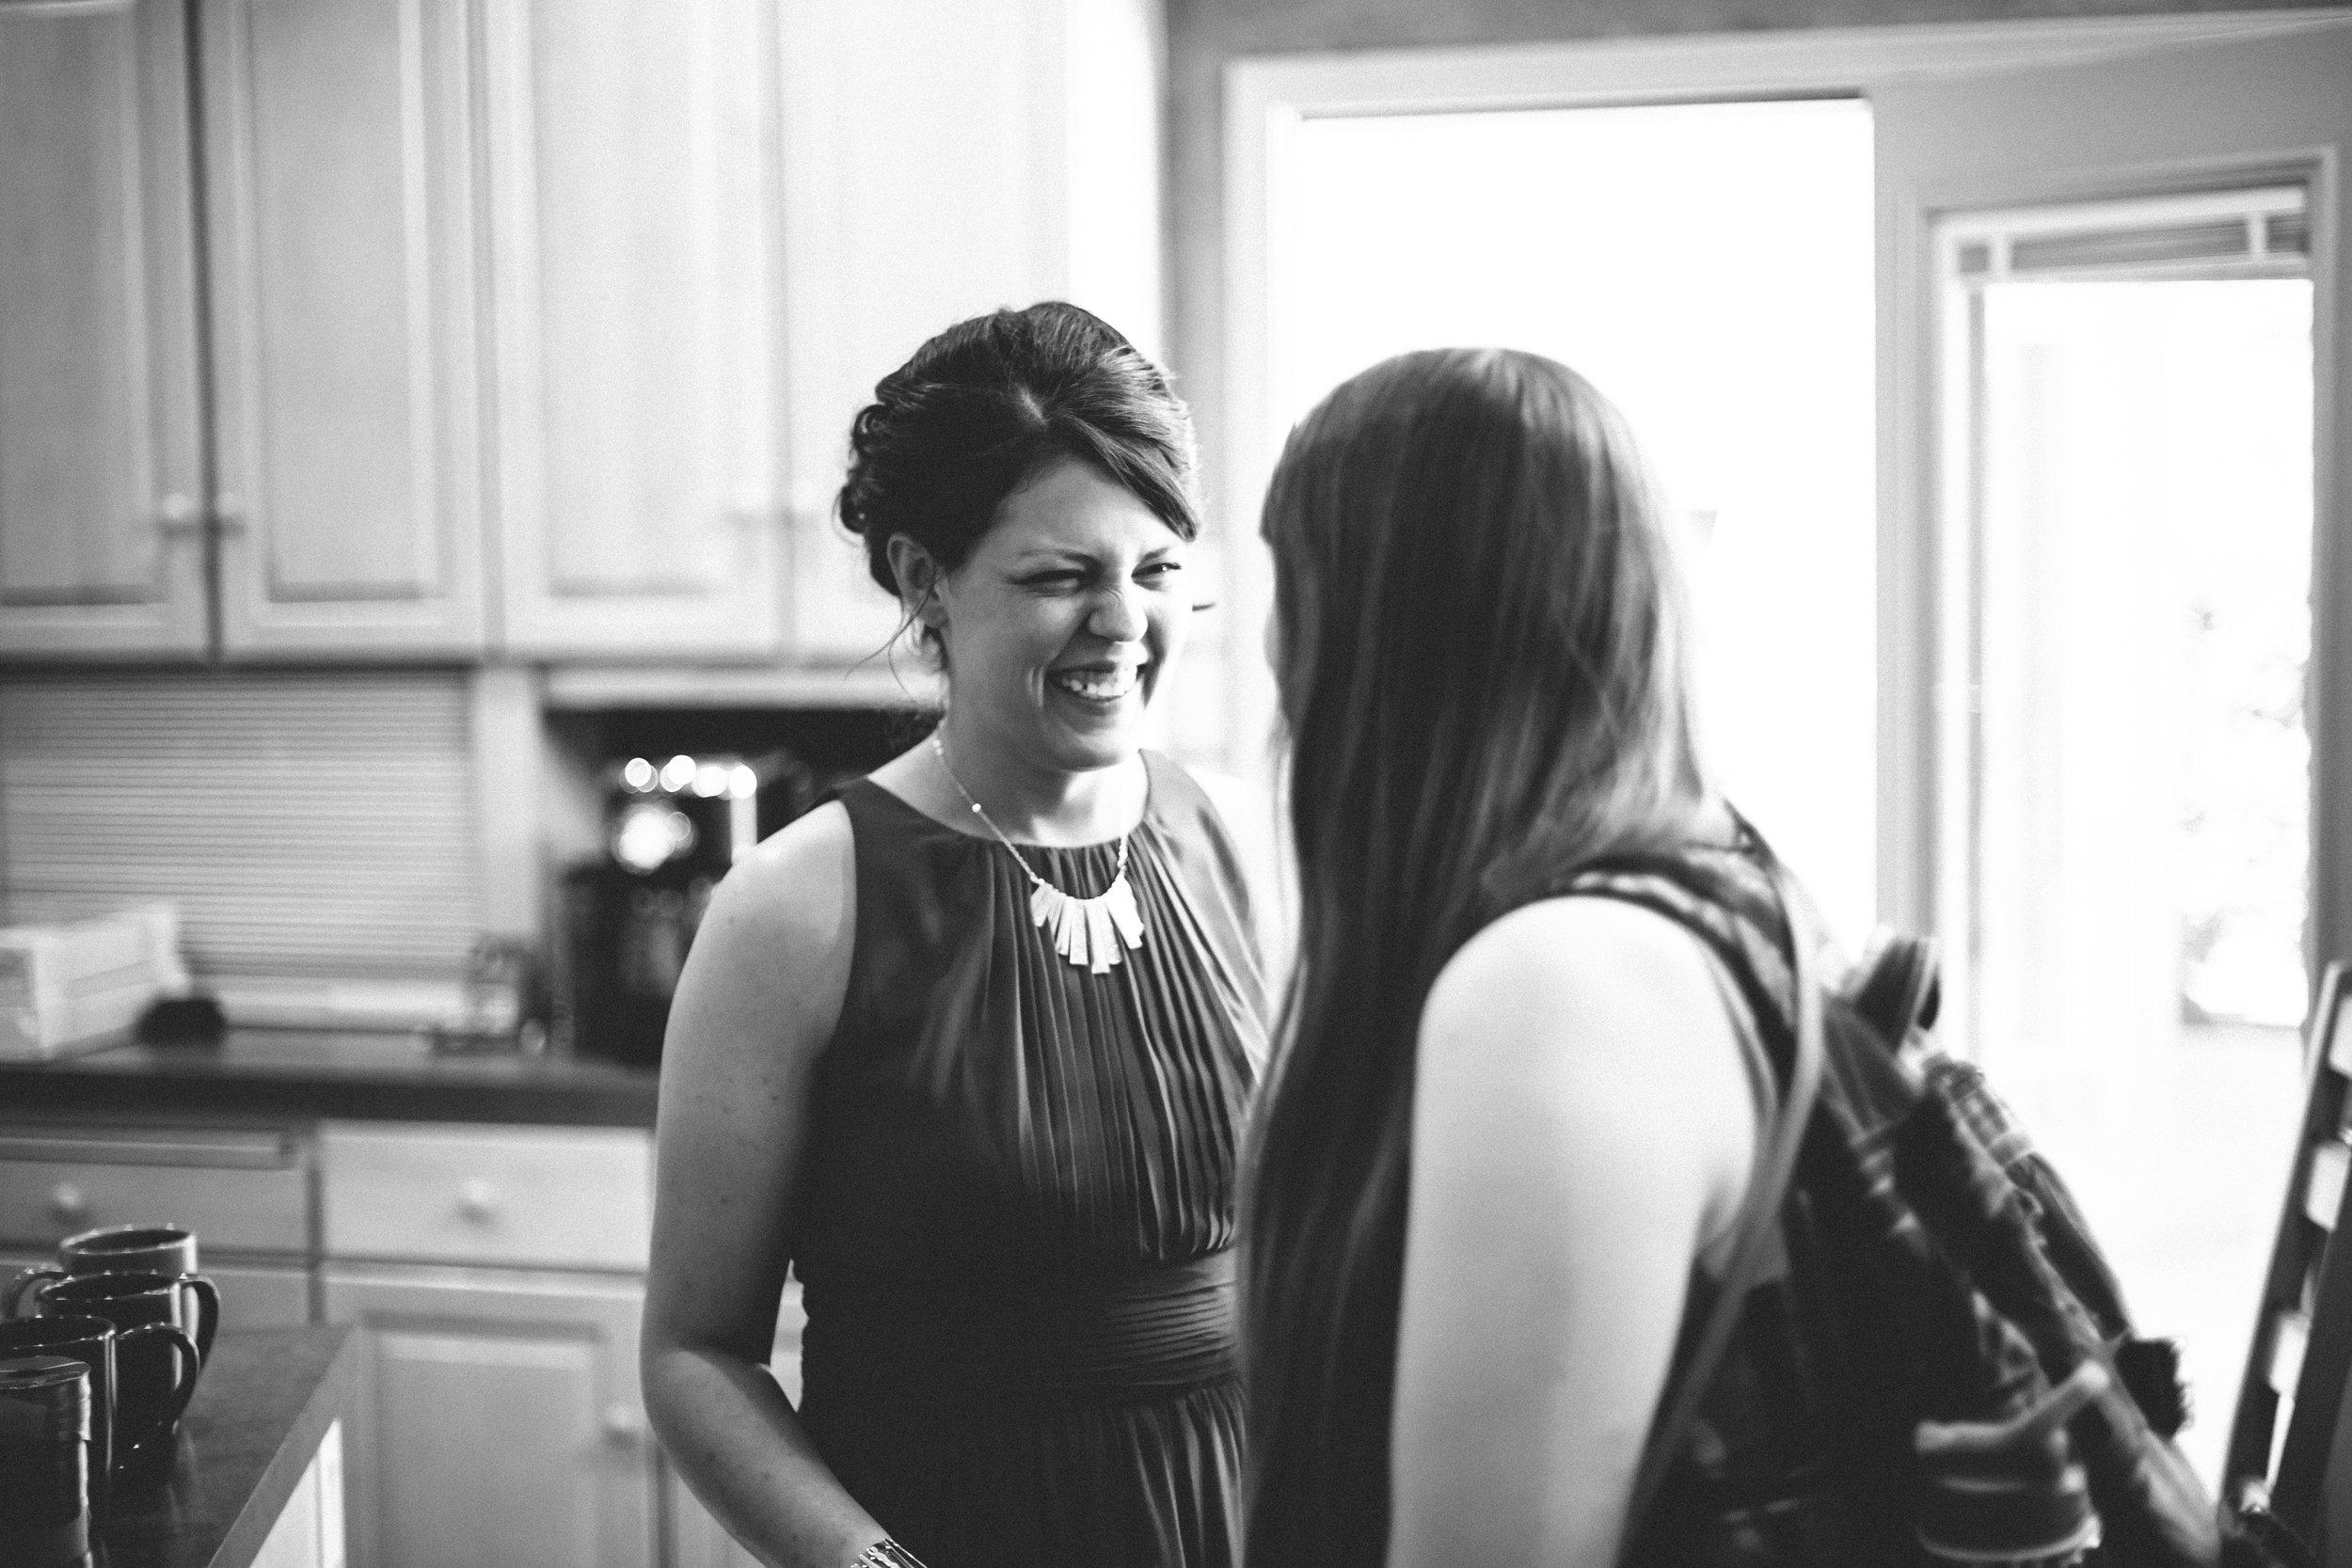 Jordan & Shantel Married - Idaho - Corrie Mick Photography-25.jpg